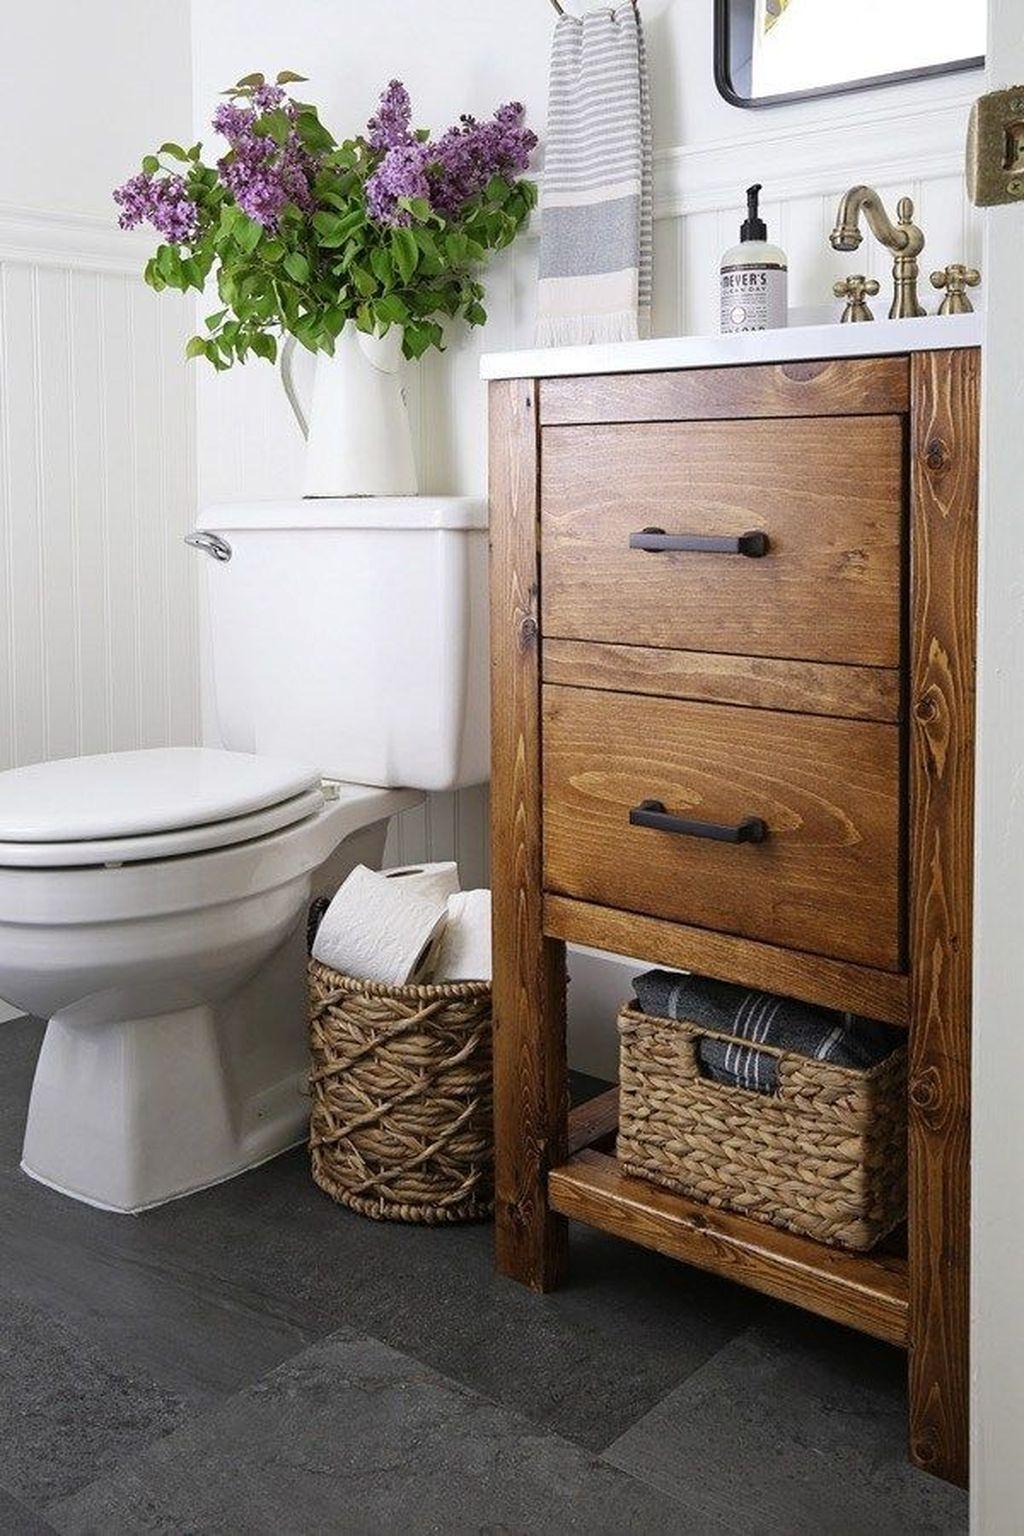 Fascinating Rustic Bathroom Decor Ideas You Must Copy 24